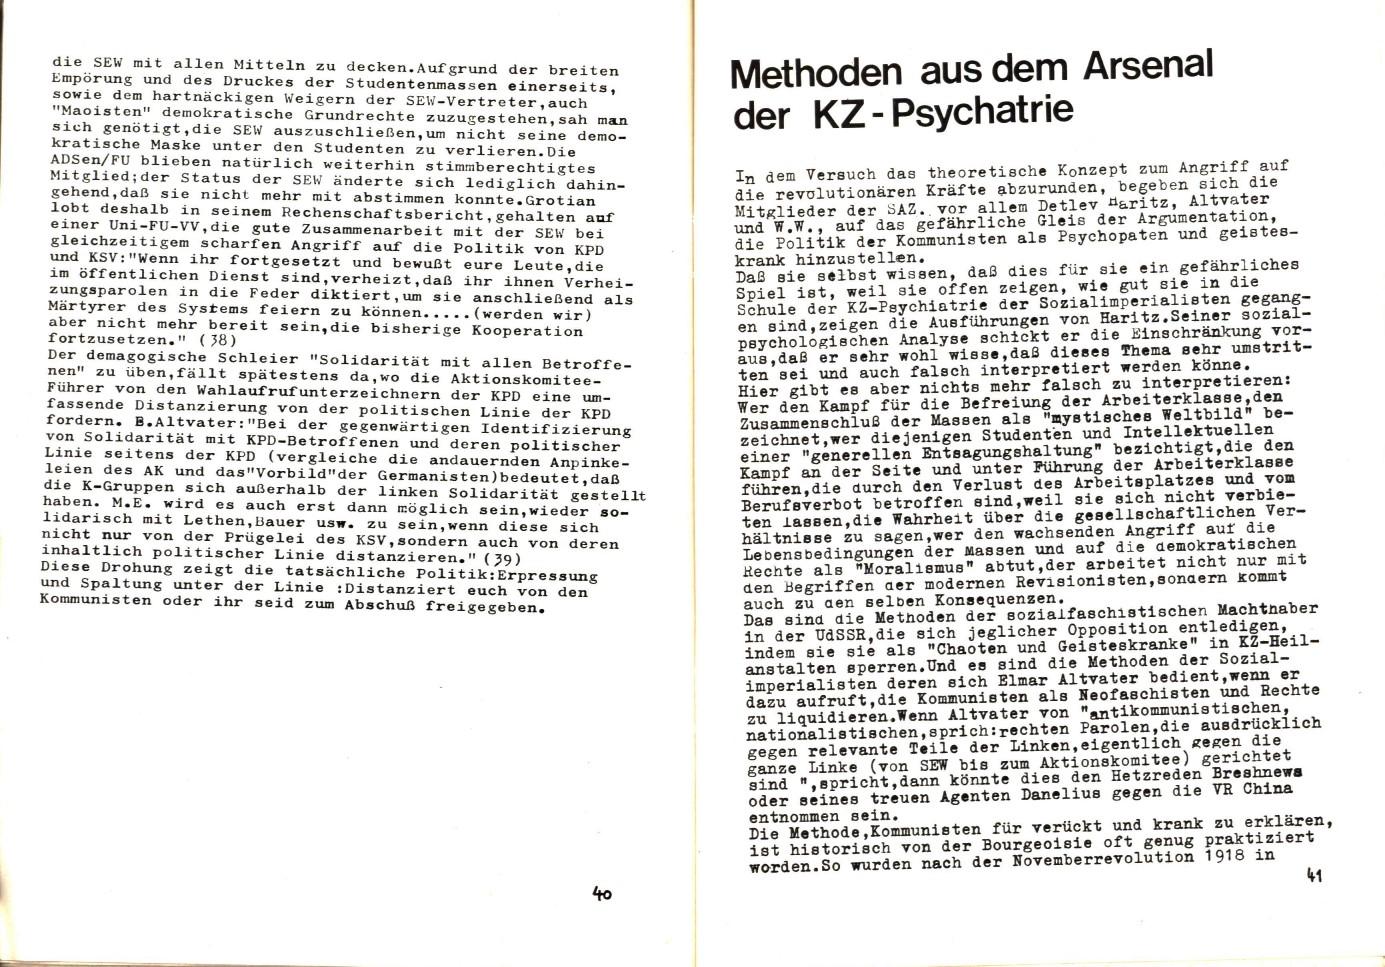 Berlin_KSV_1975_Dokumente_der_SAZ_22